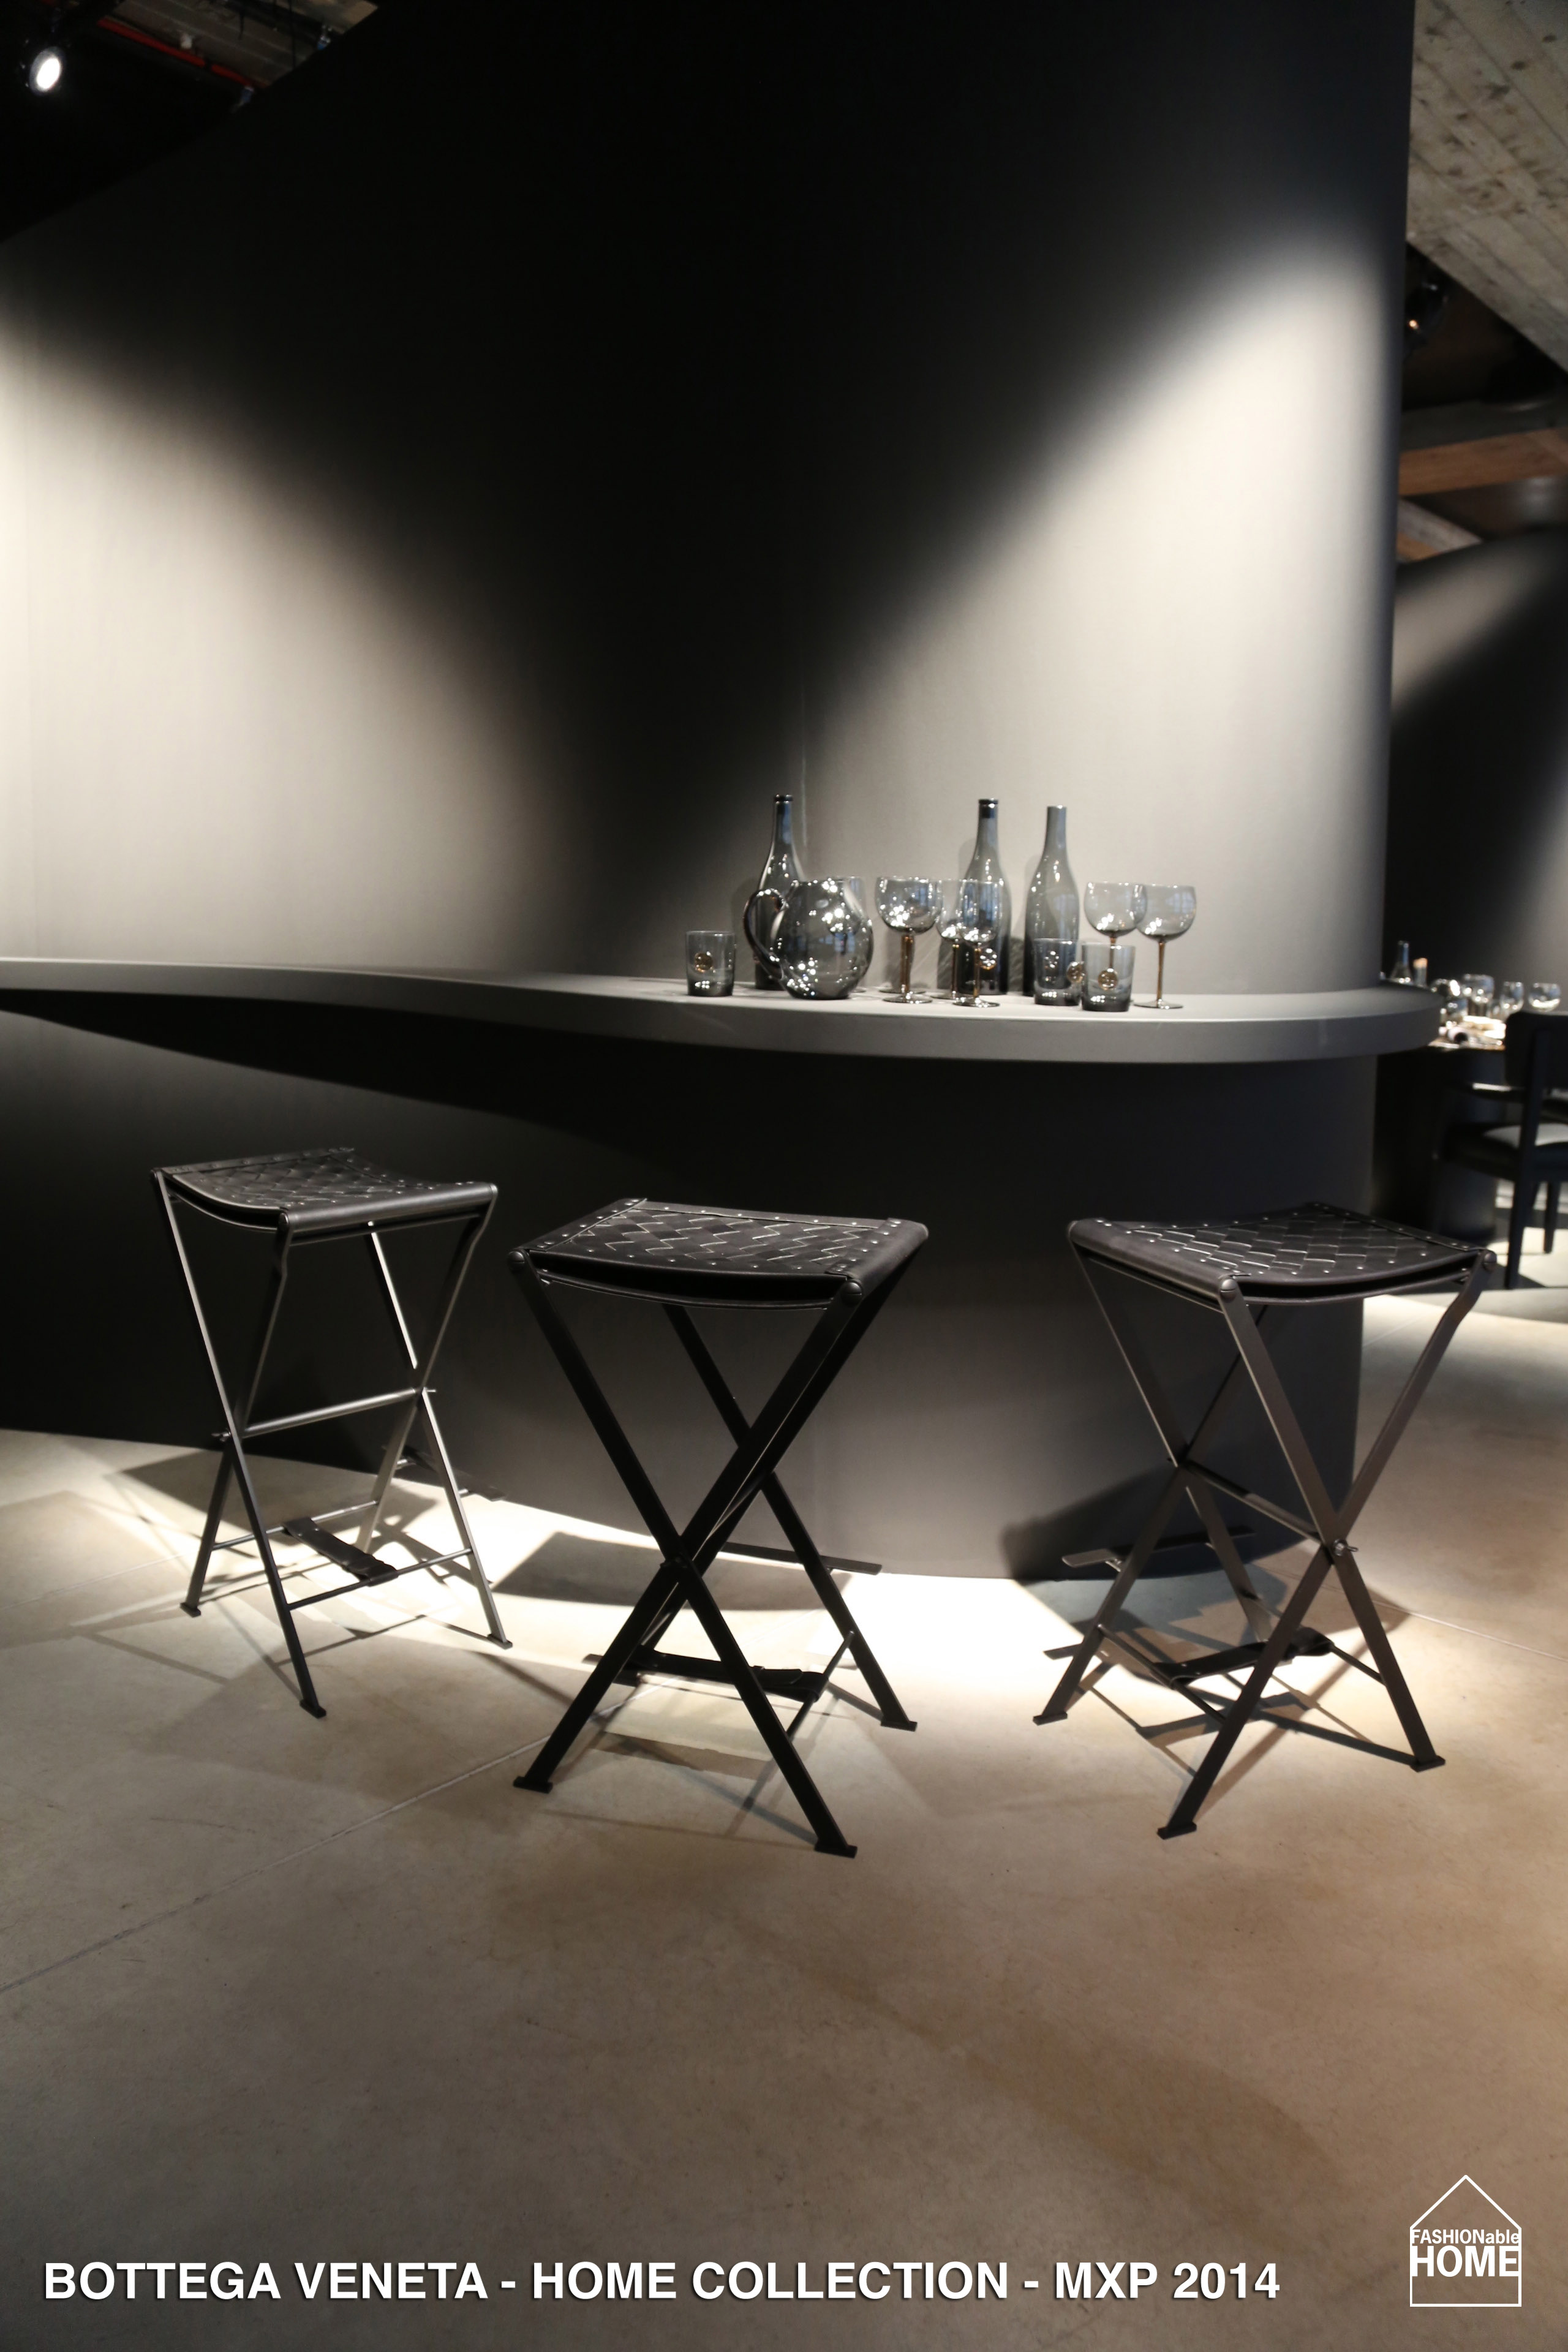 New BOTTEGA VENETA Home Collection  Milano 2014